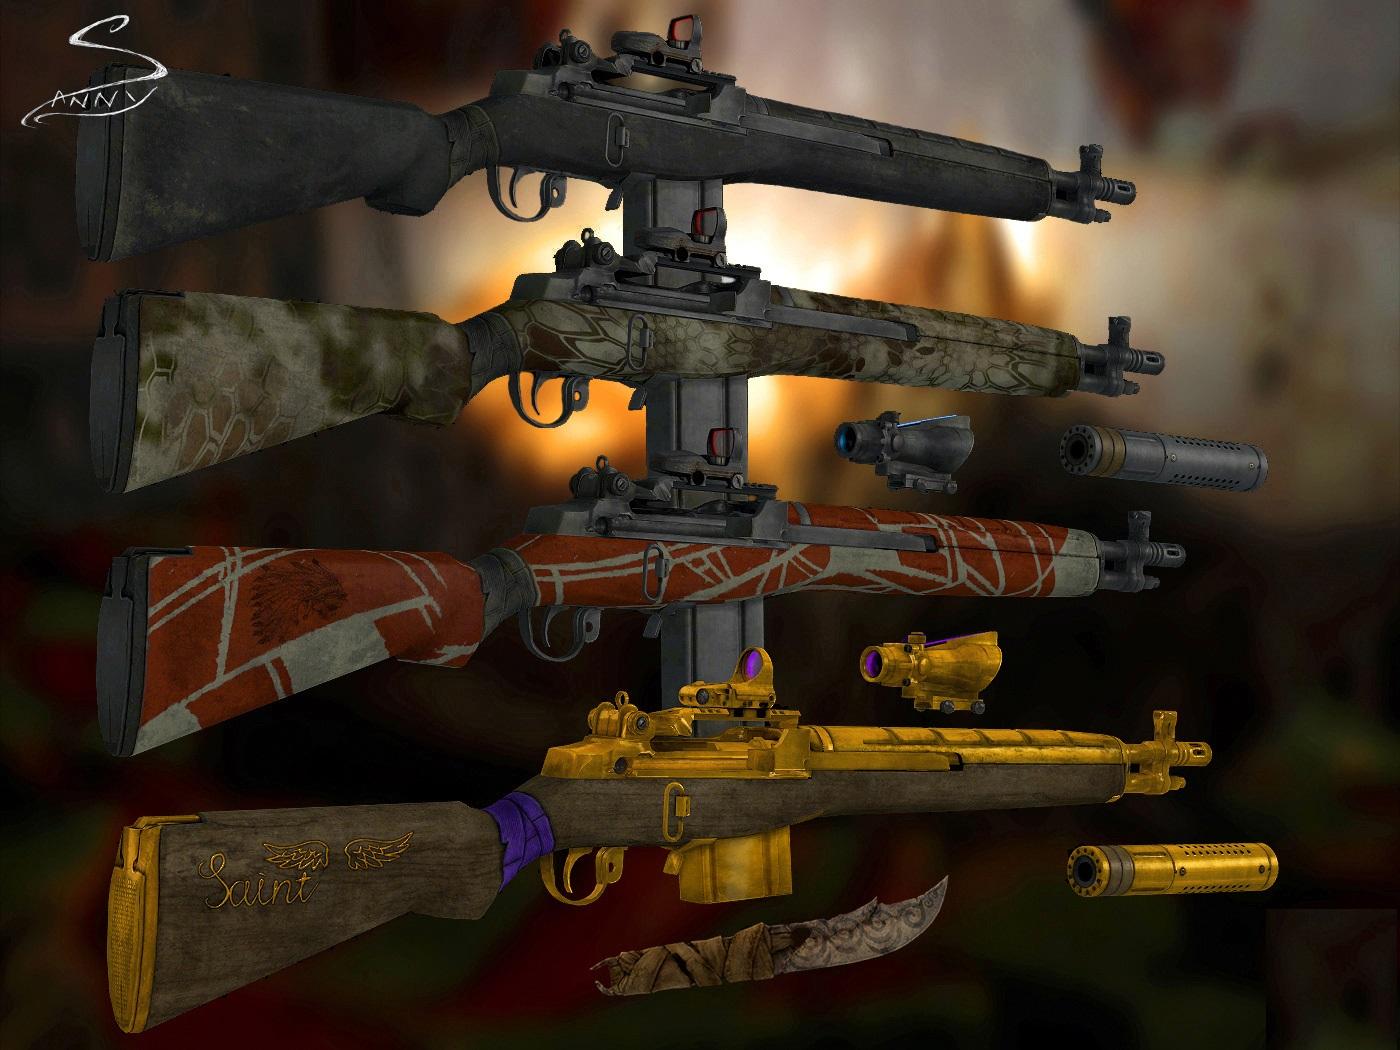 Fallout где найти винтовку гаусса